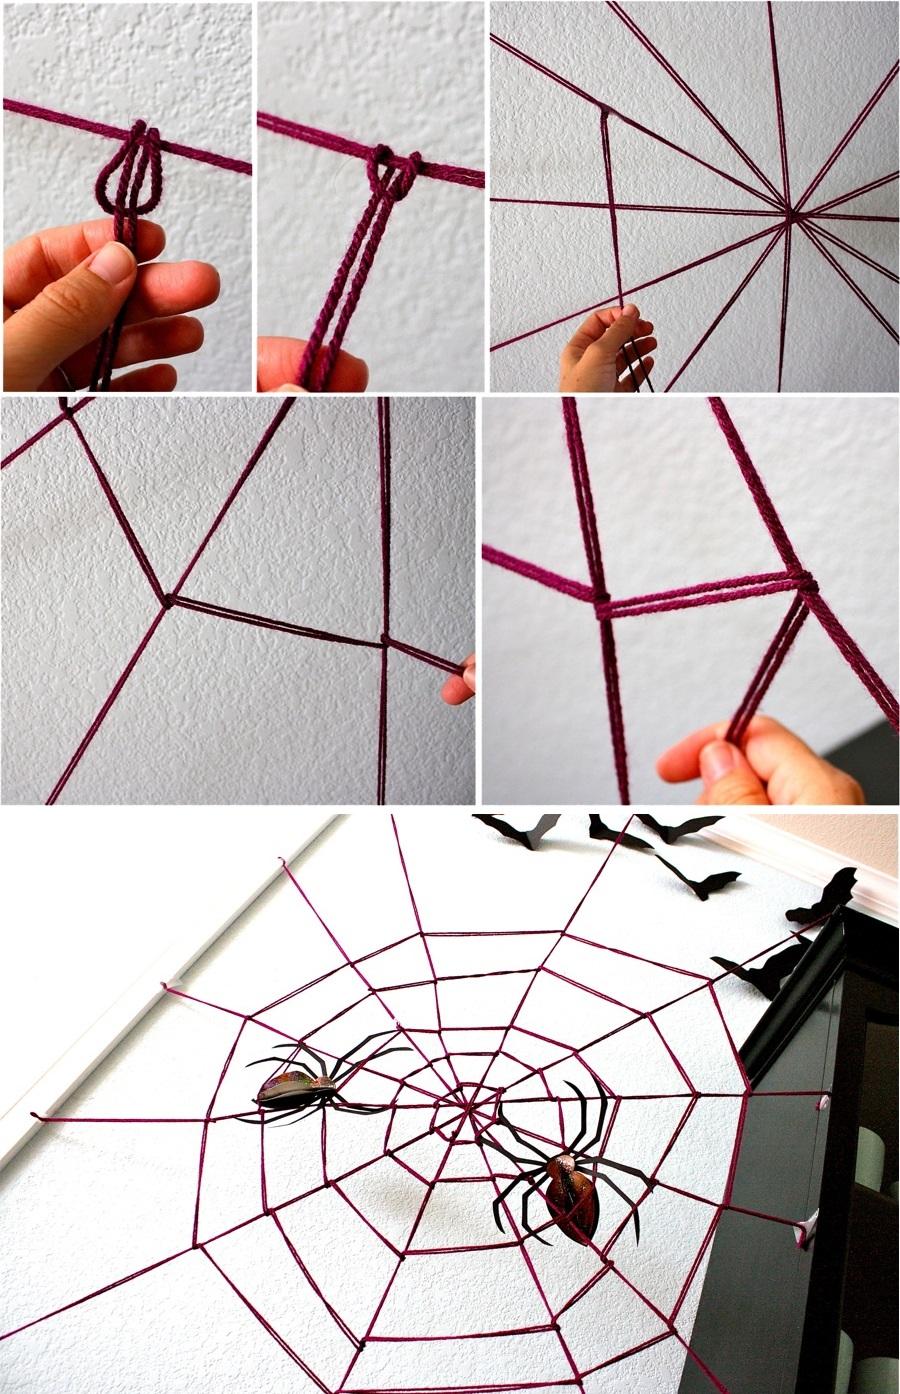 Creating the DIY yarn spider web